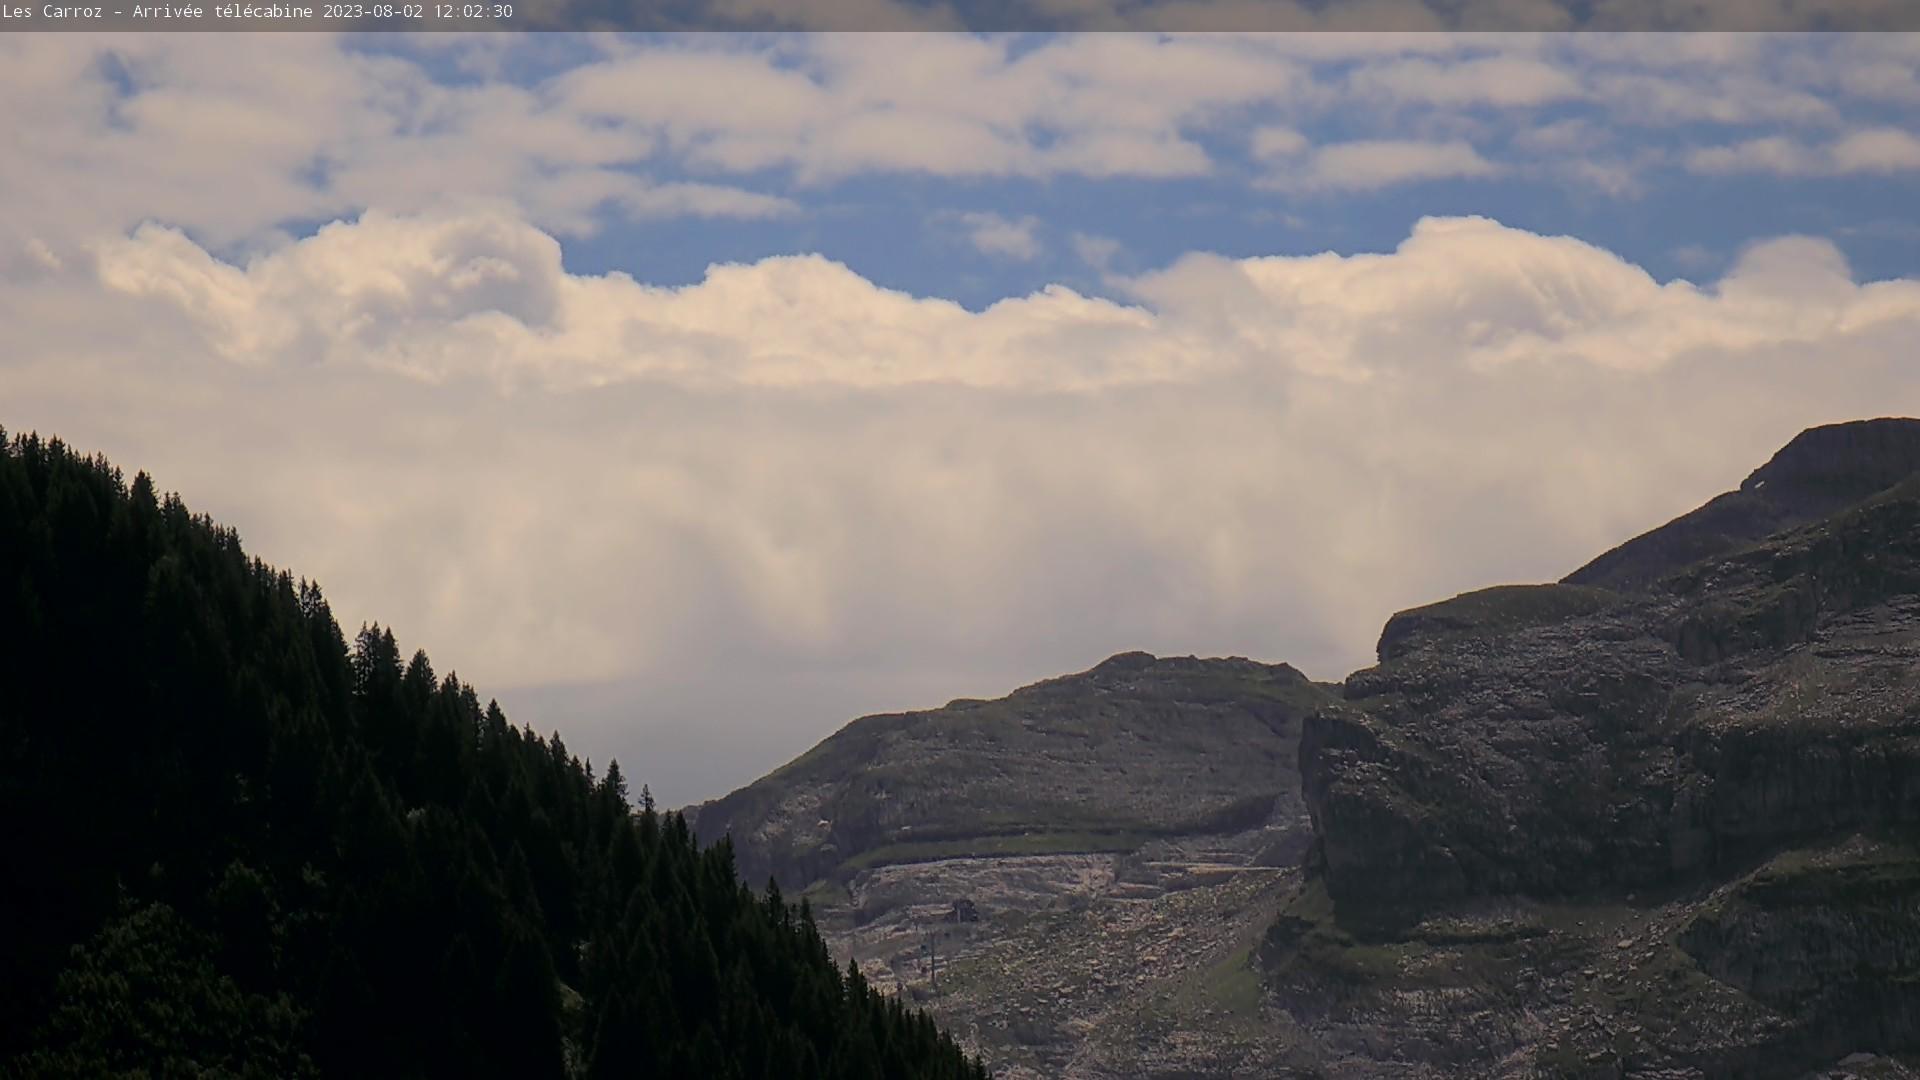 Les Carroz web camera - Kedeuze ski station